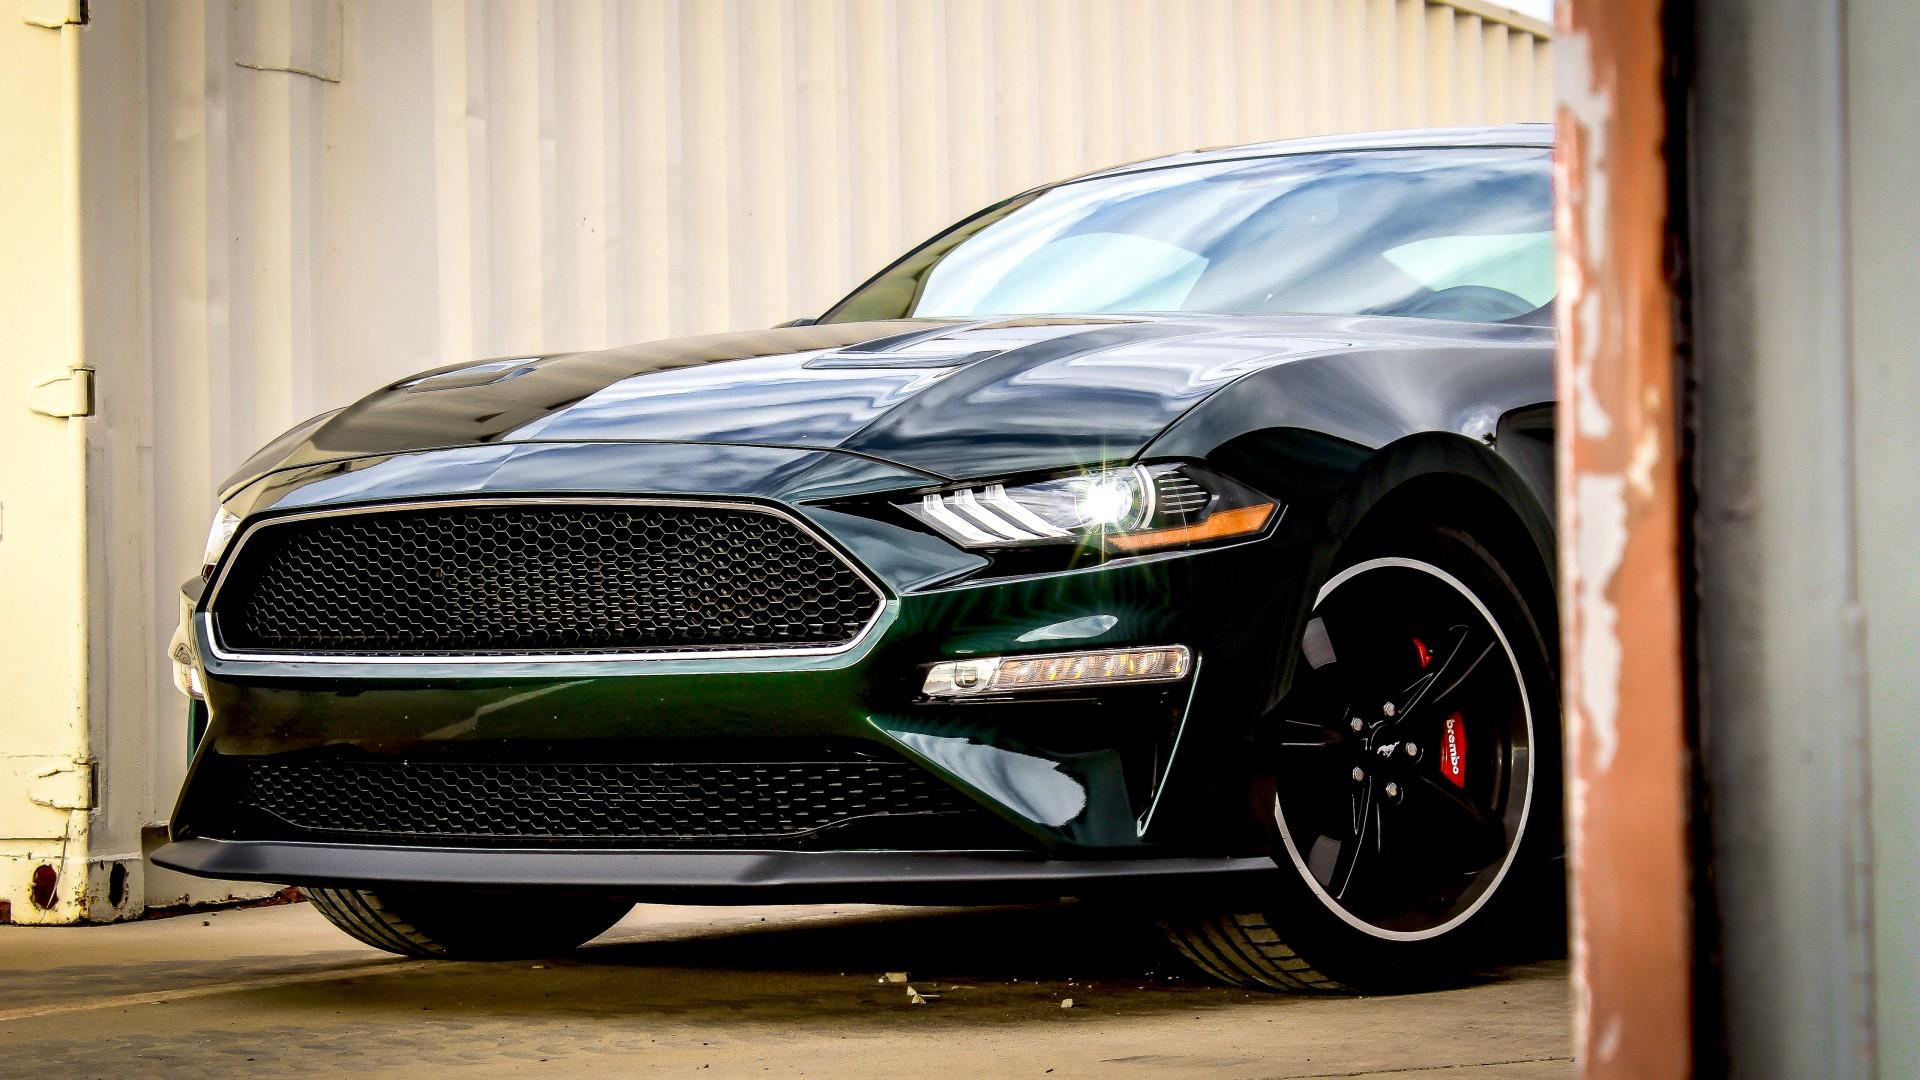 2019 Ford Mustang Bullitt 5k Wallpaper Hd Car Wallpapers